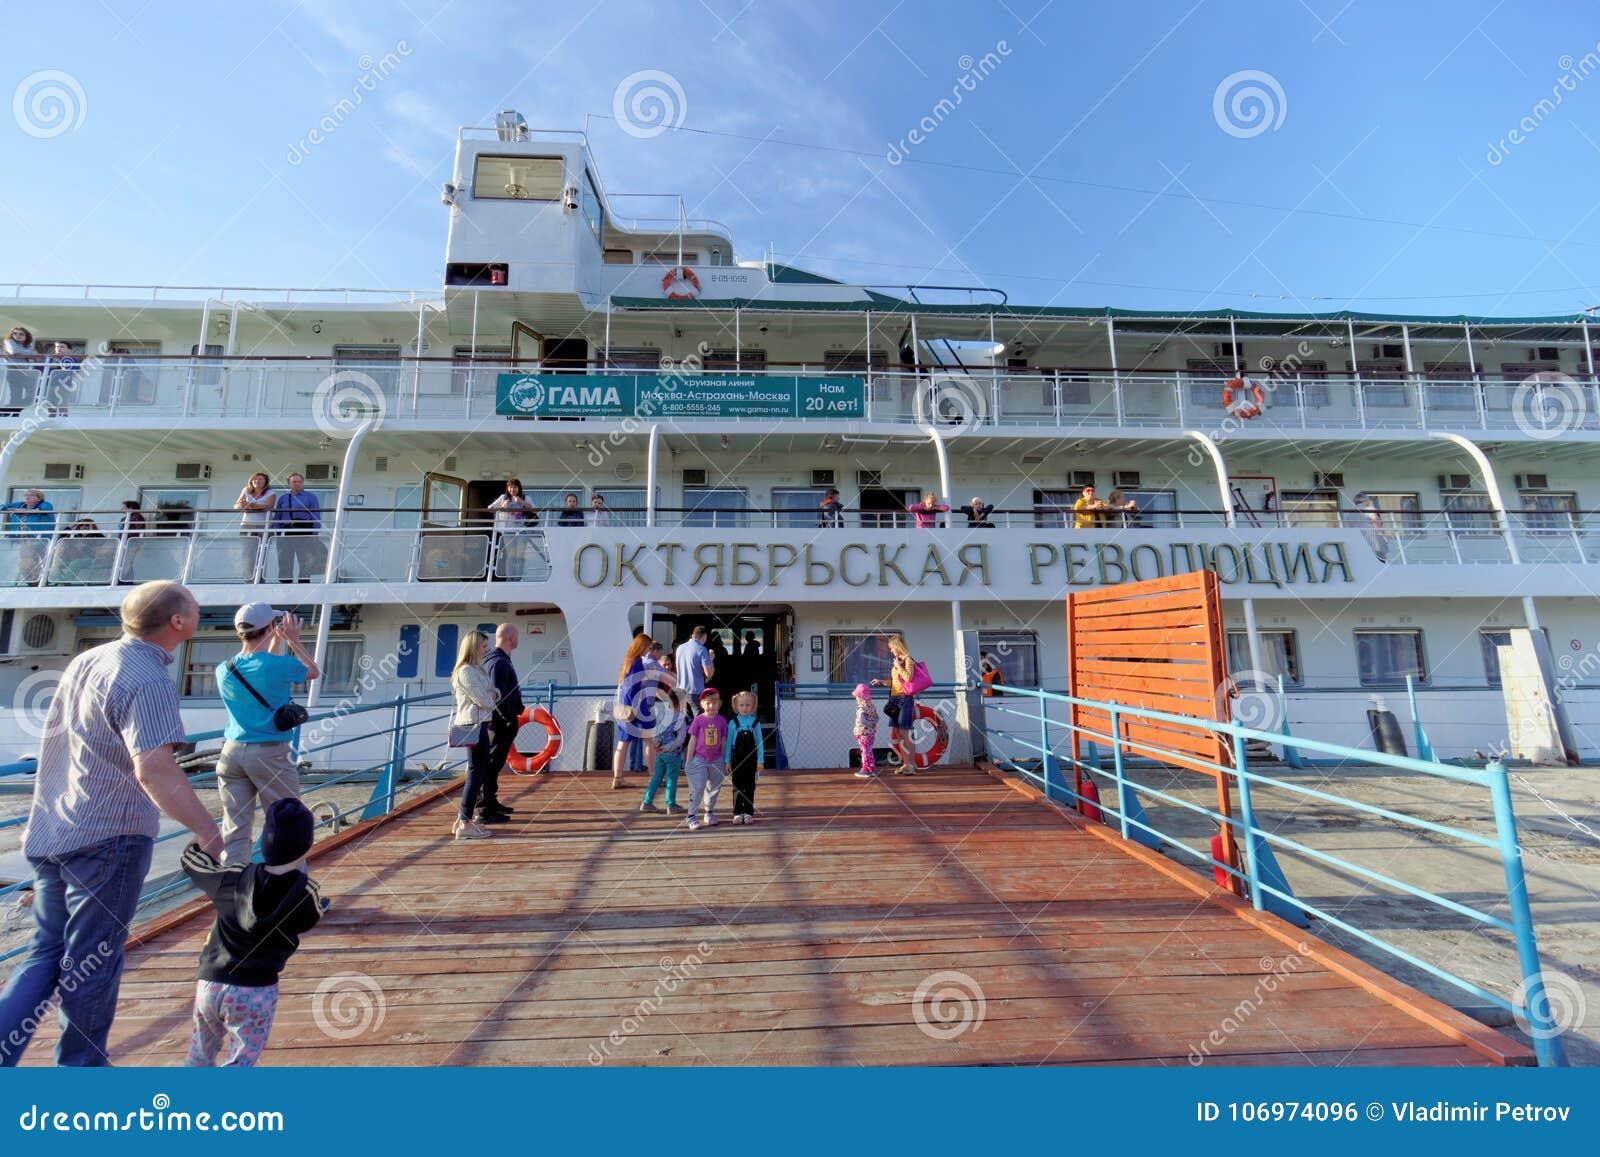 Rybinsk from the ship